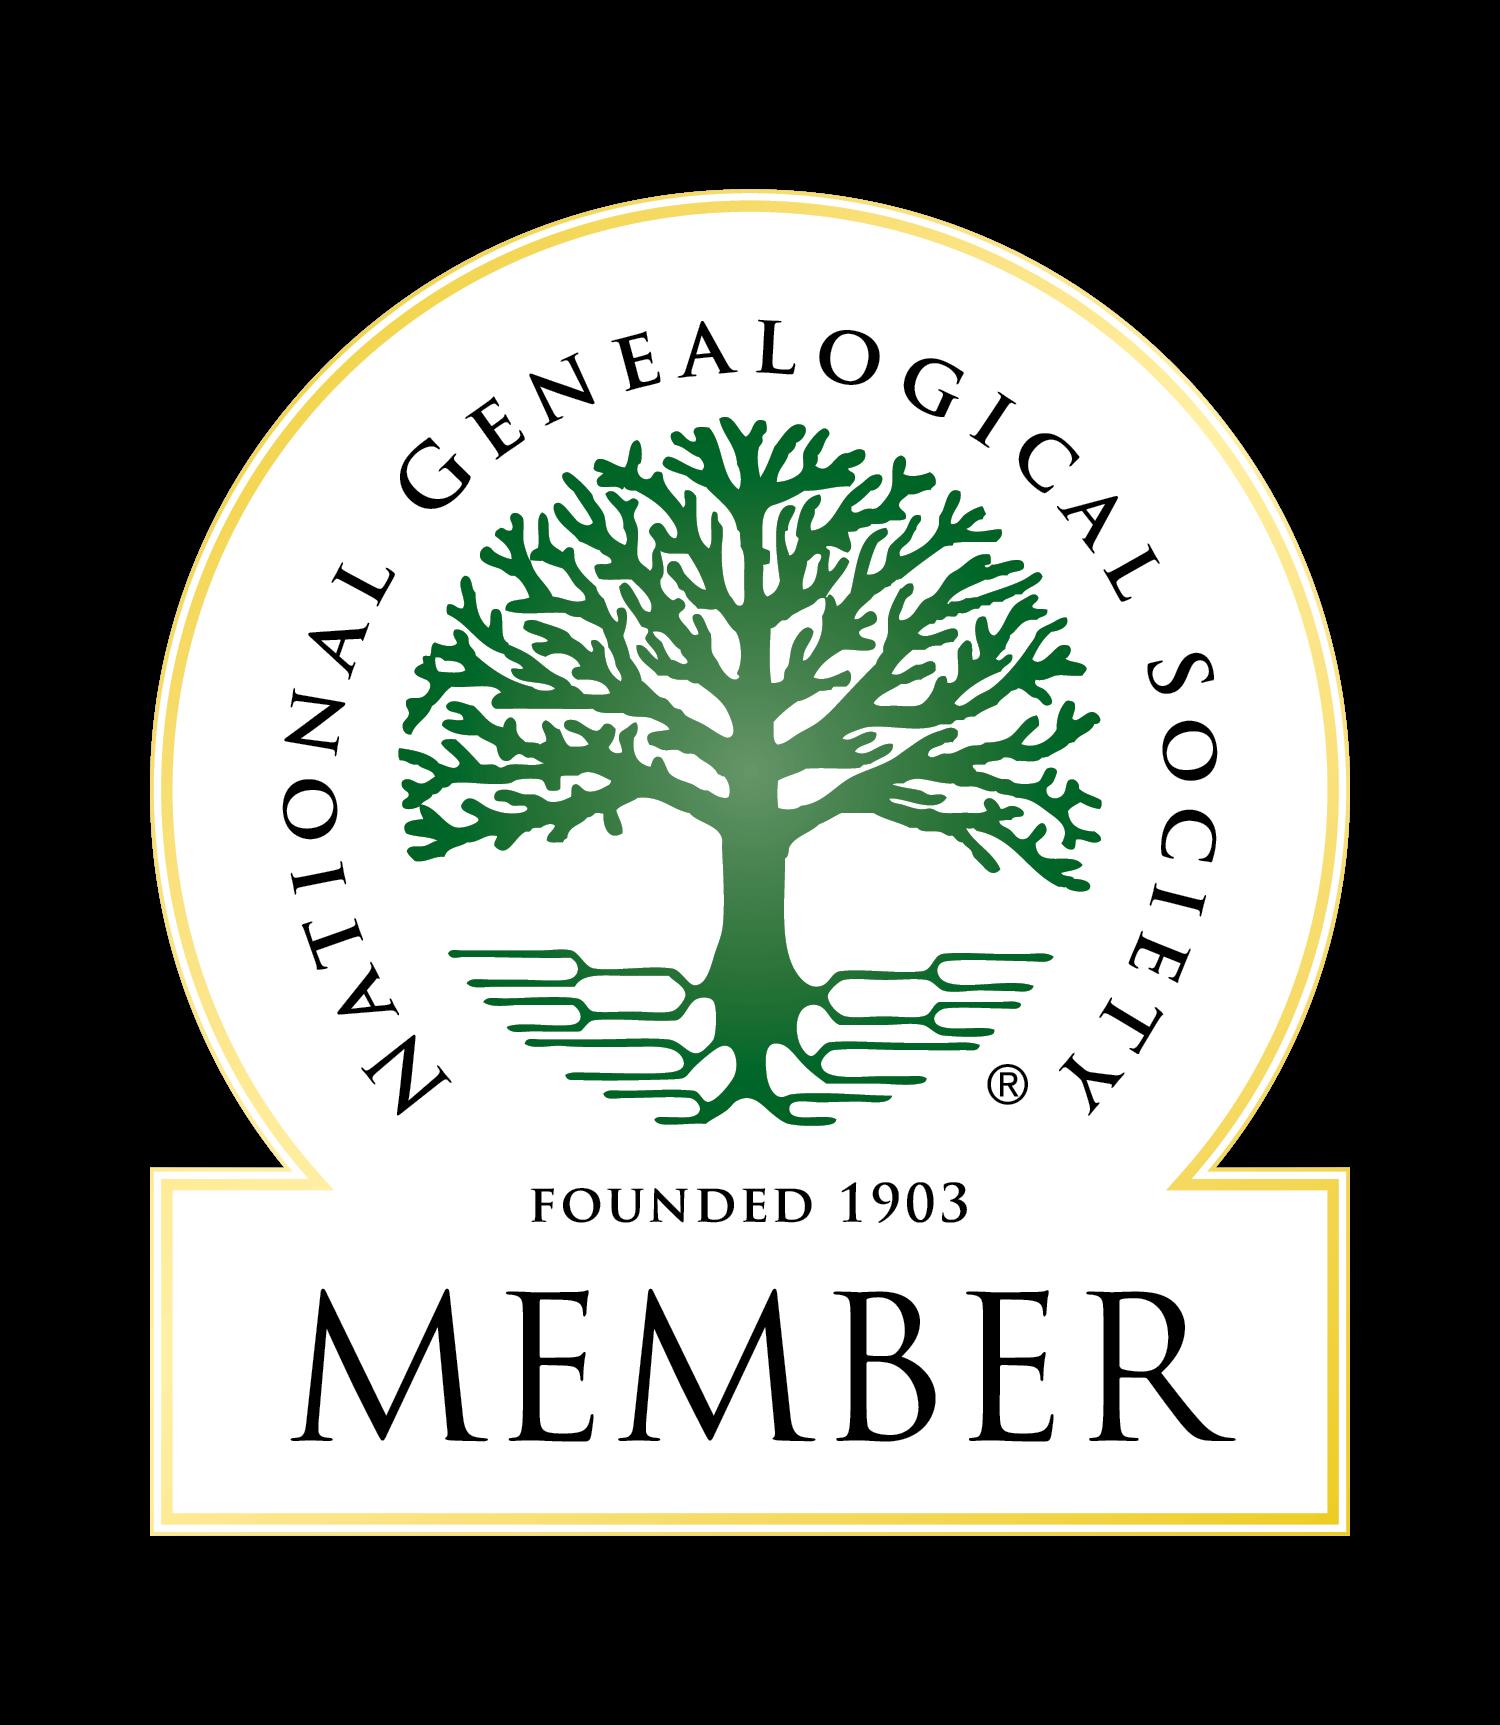 National Genealogical Society Member